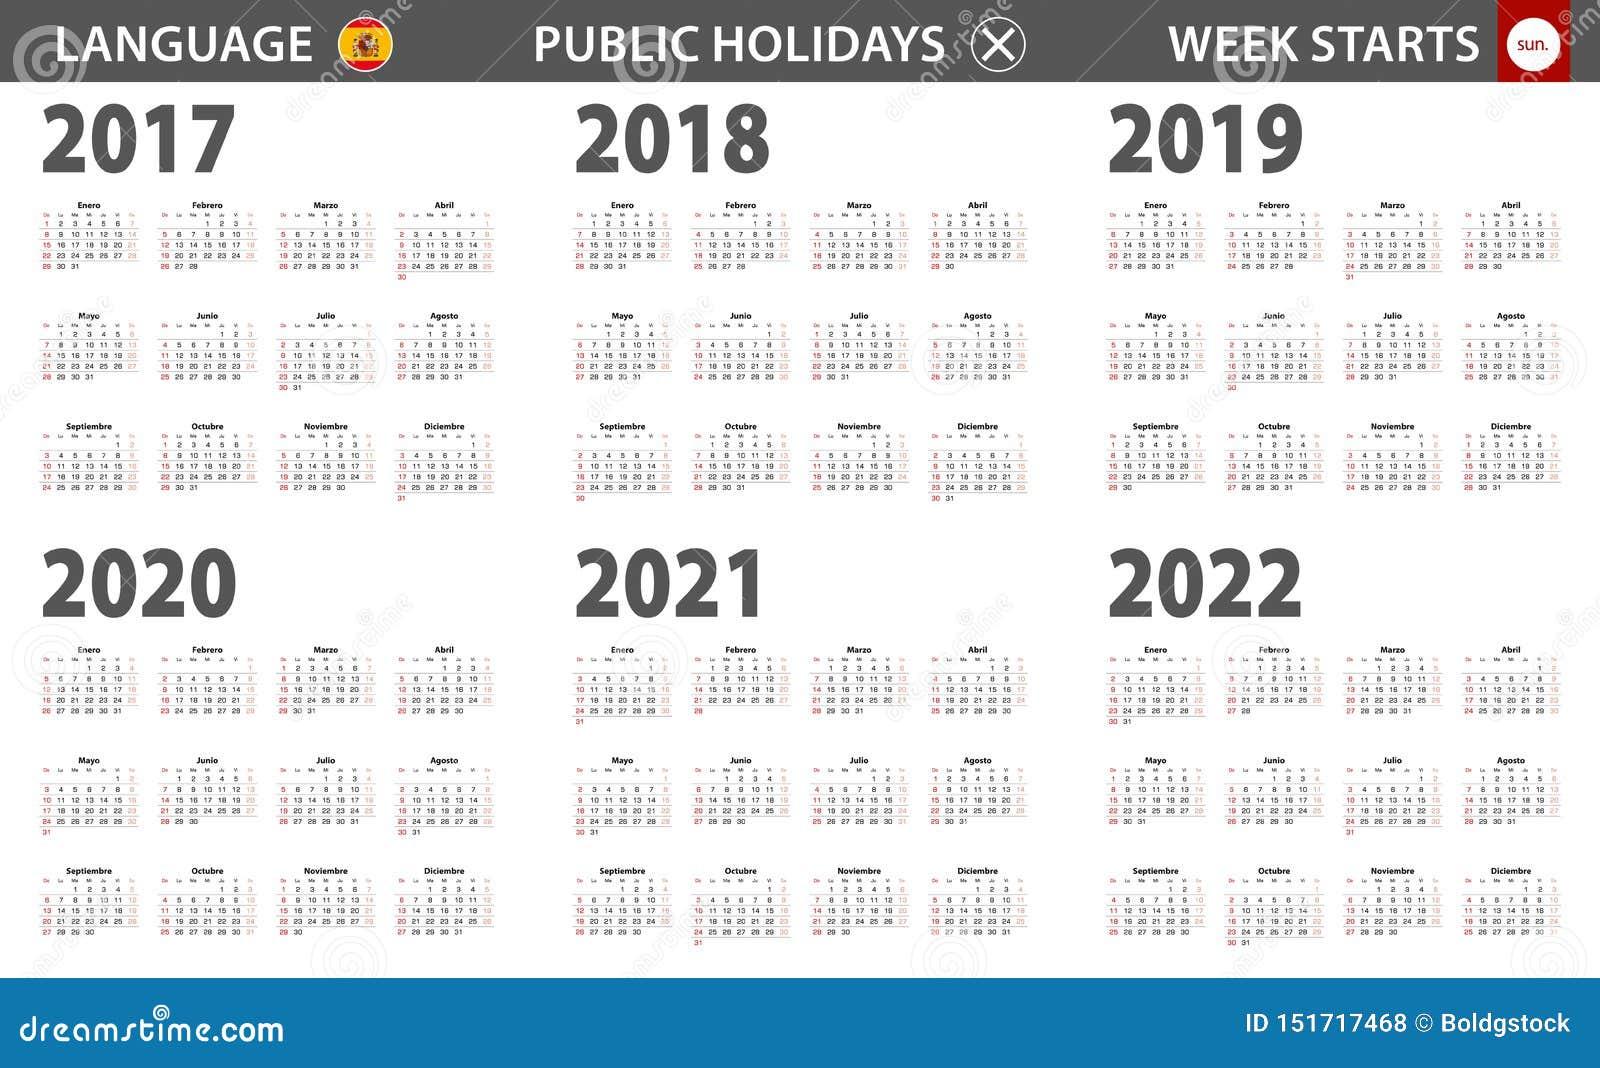 Spanish Calendar 2022.2017 2022 Year Calendar In Spanish Language Week Starts From Sunday Stock Vector Illustration Of 2021 Planner 151717468